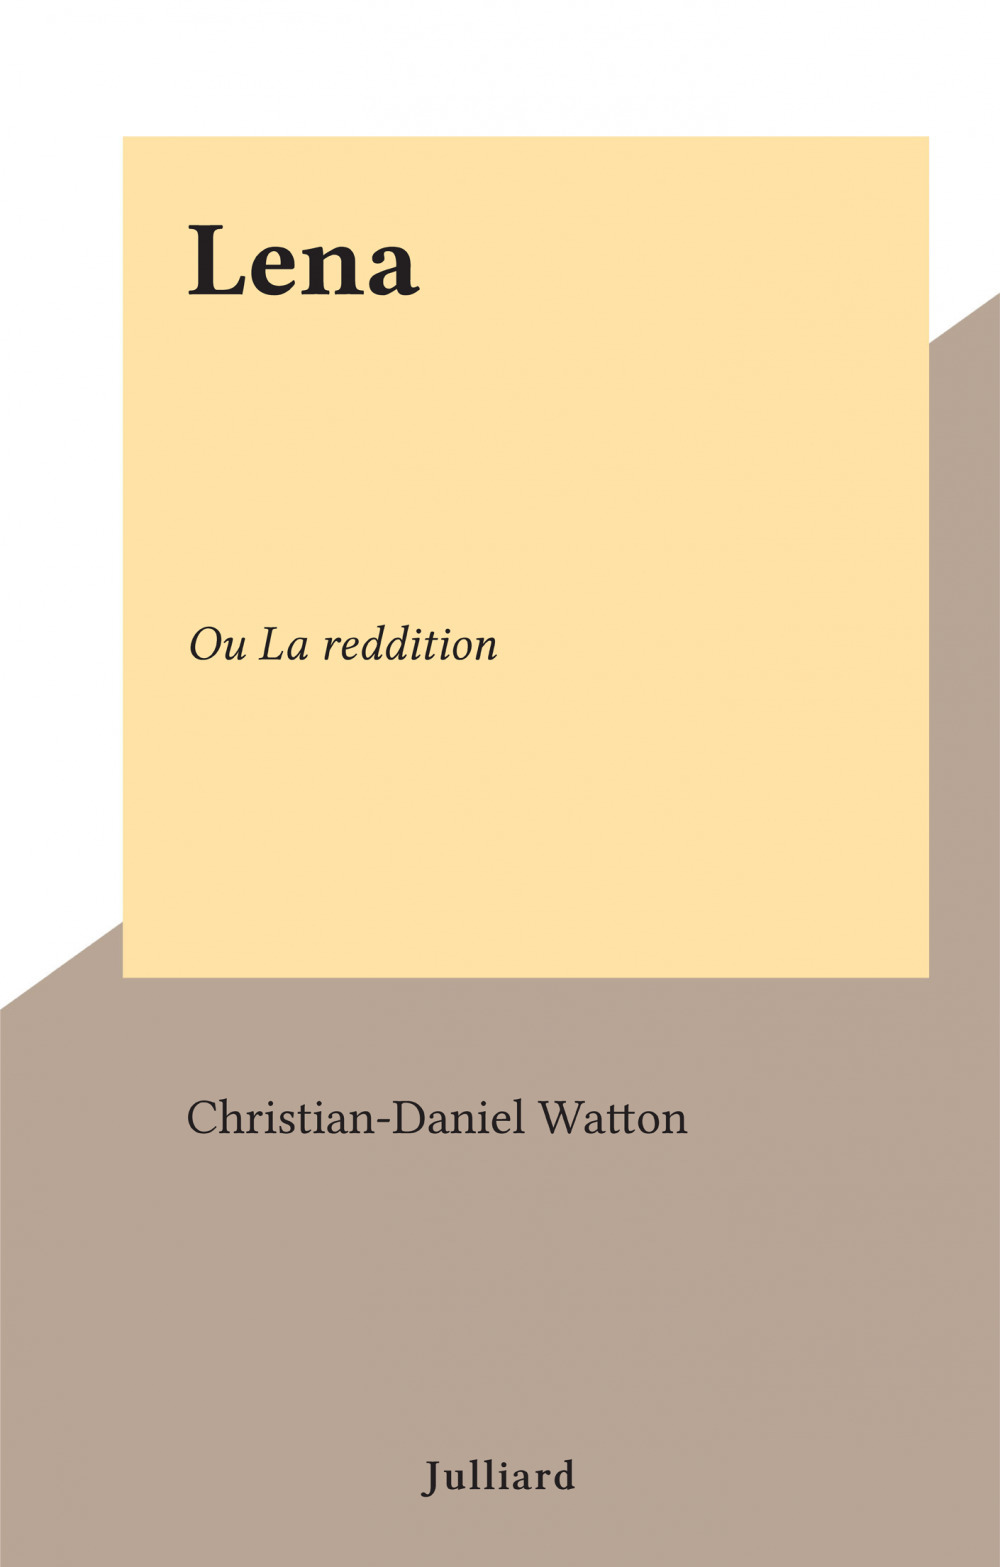 Lena  - Christian-Daniel Watton